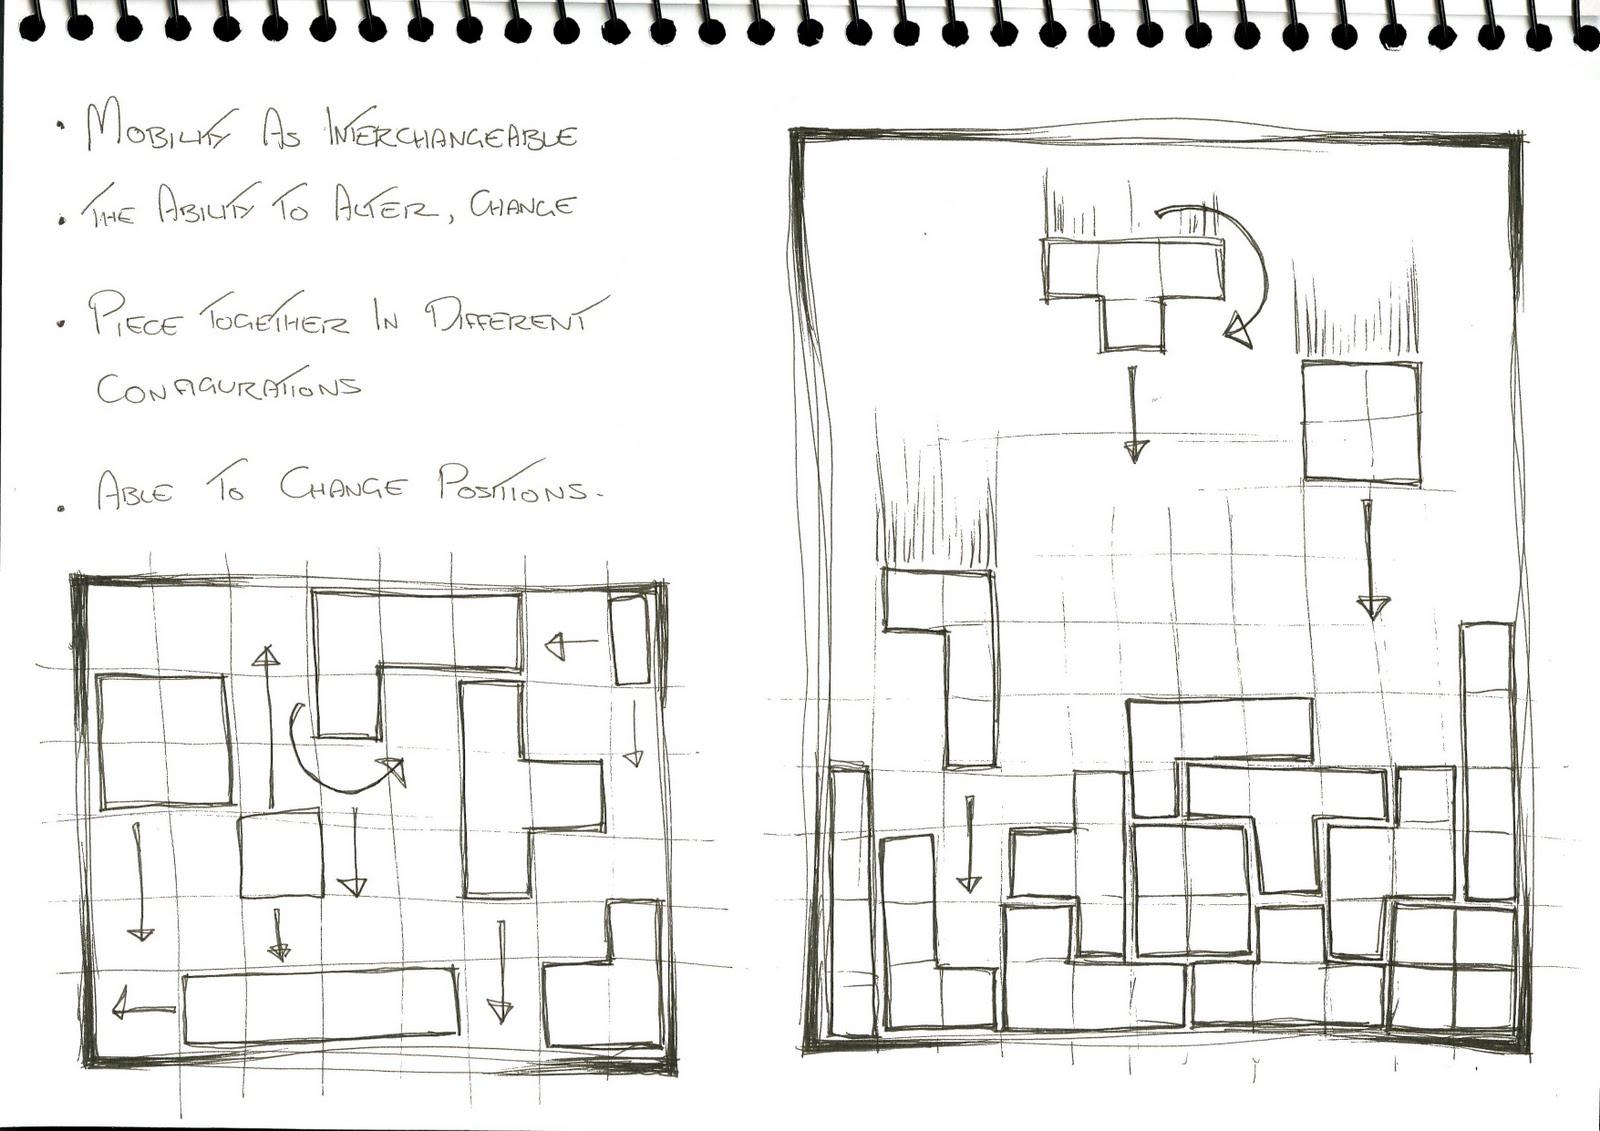 Architectural Design 8 August